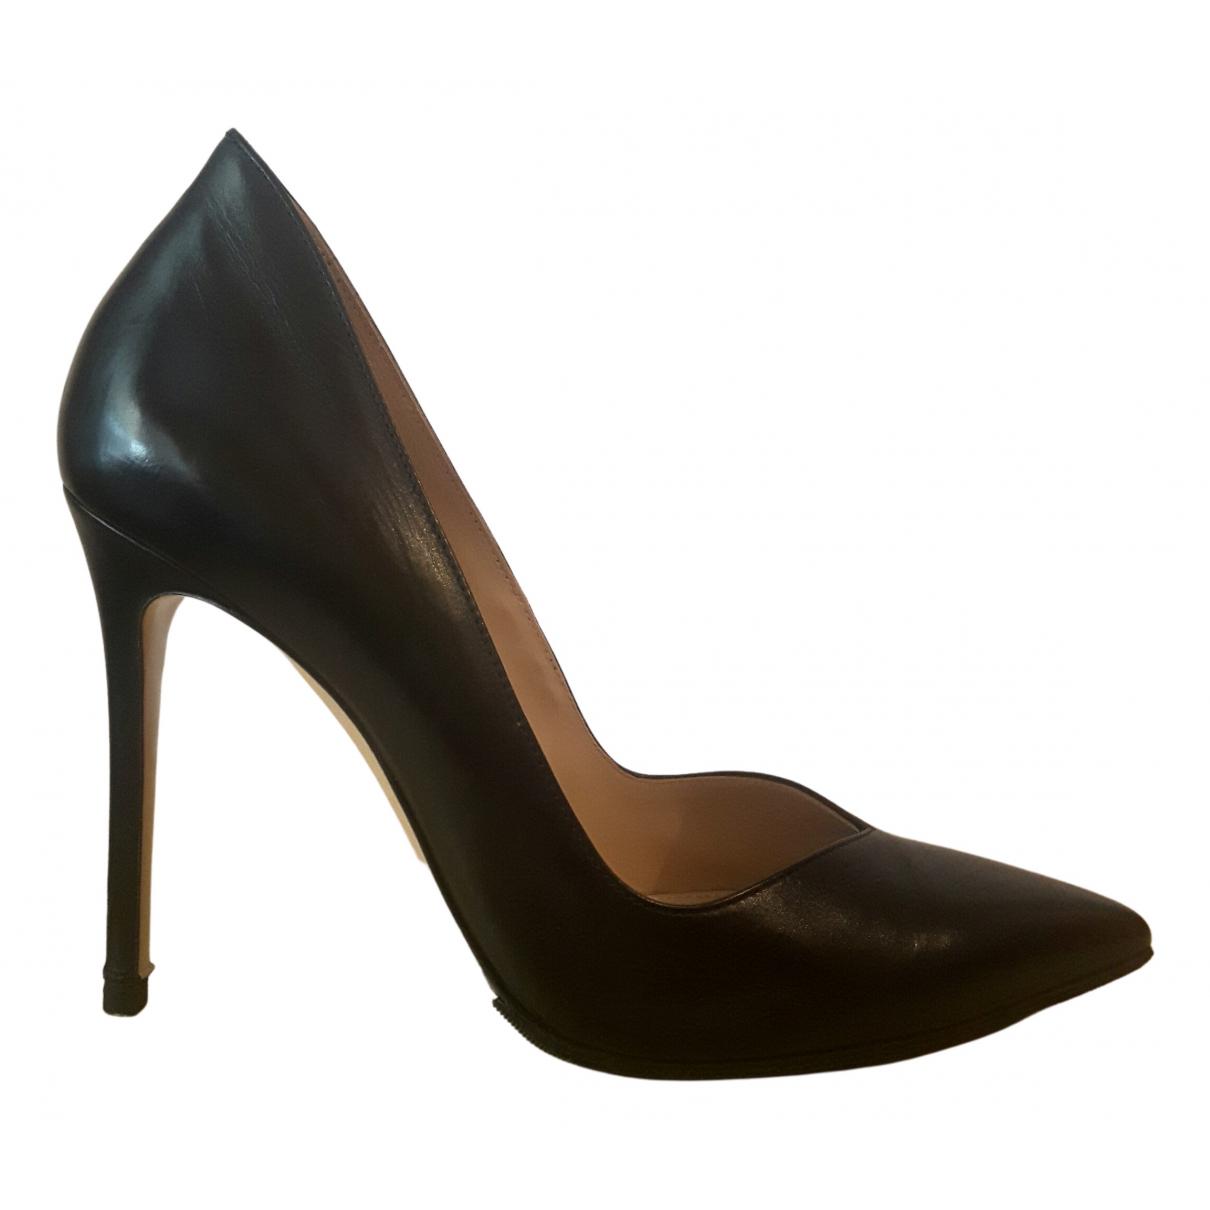 Gianvito Rossi Gianvito Black Leather Heels for Women 38 IT